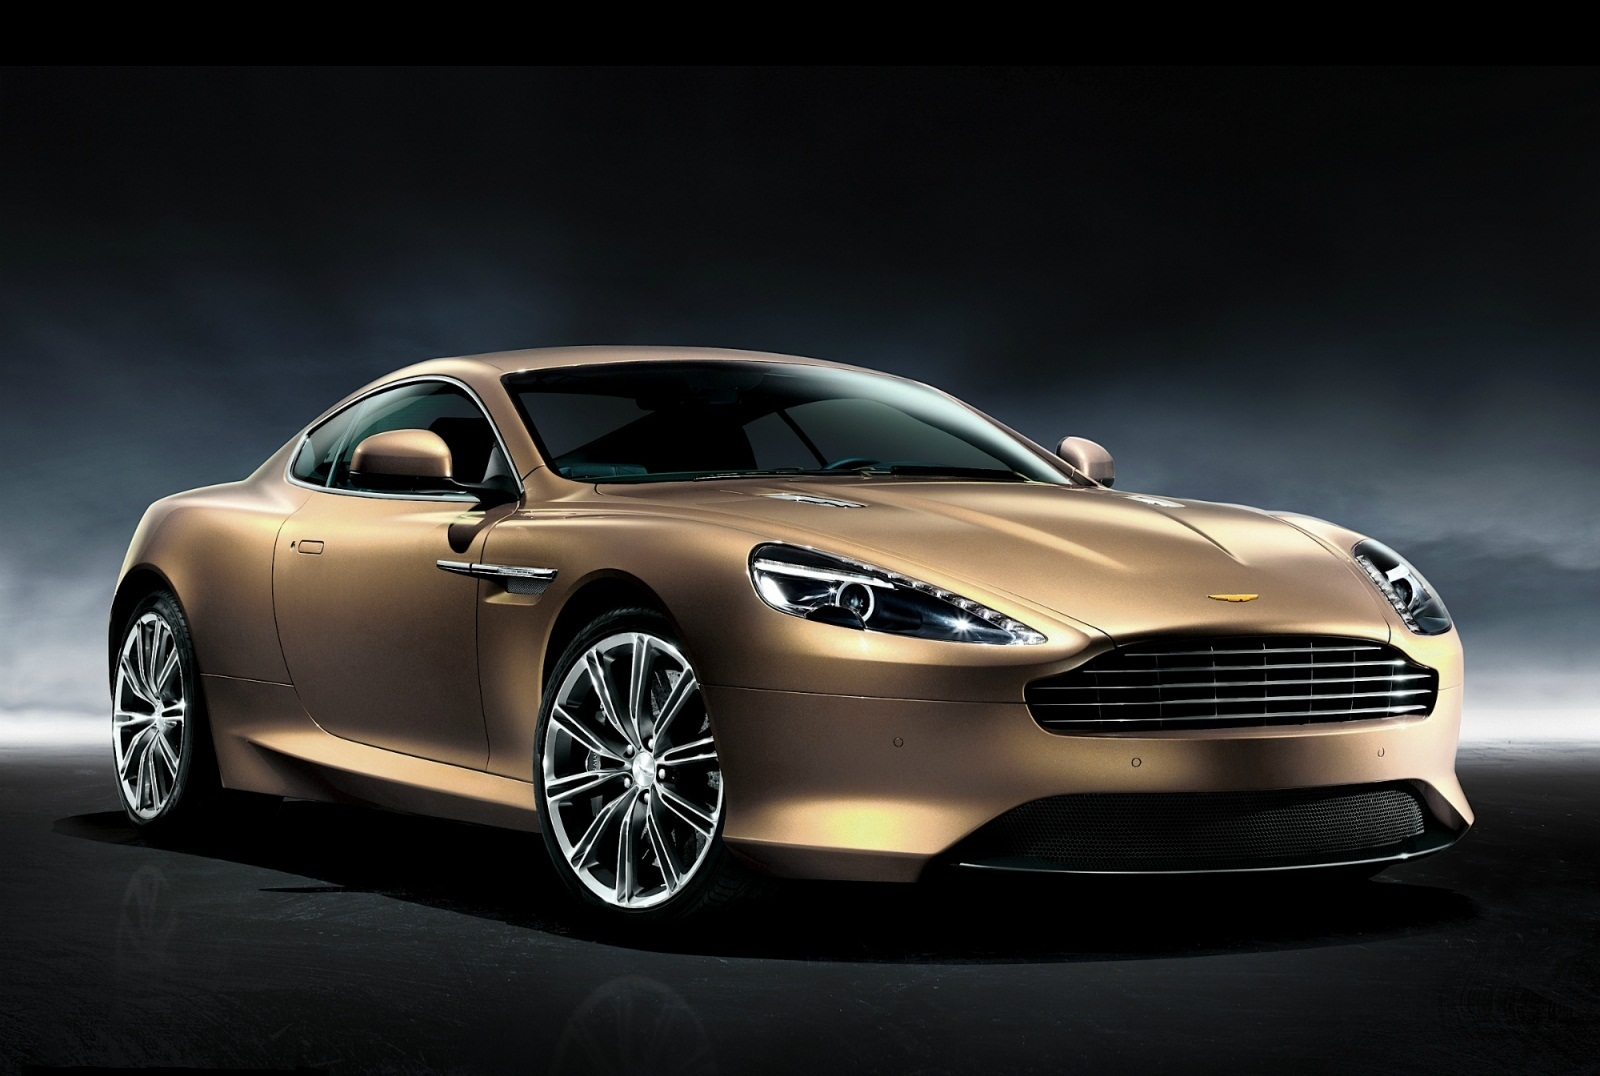 Sport Car Garage Aston Martin Virage Dragon 88 Limited